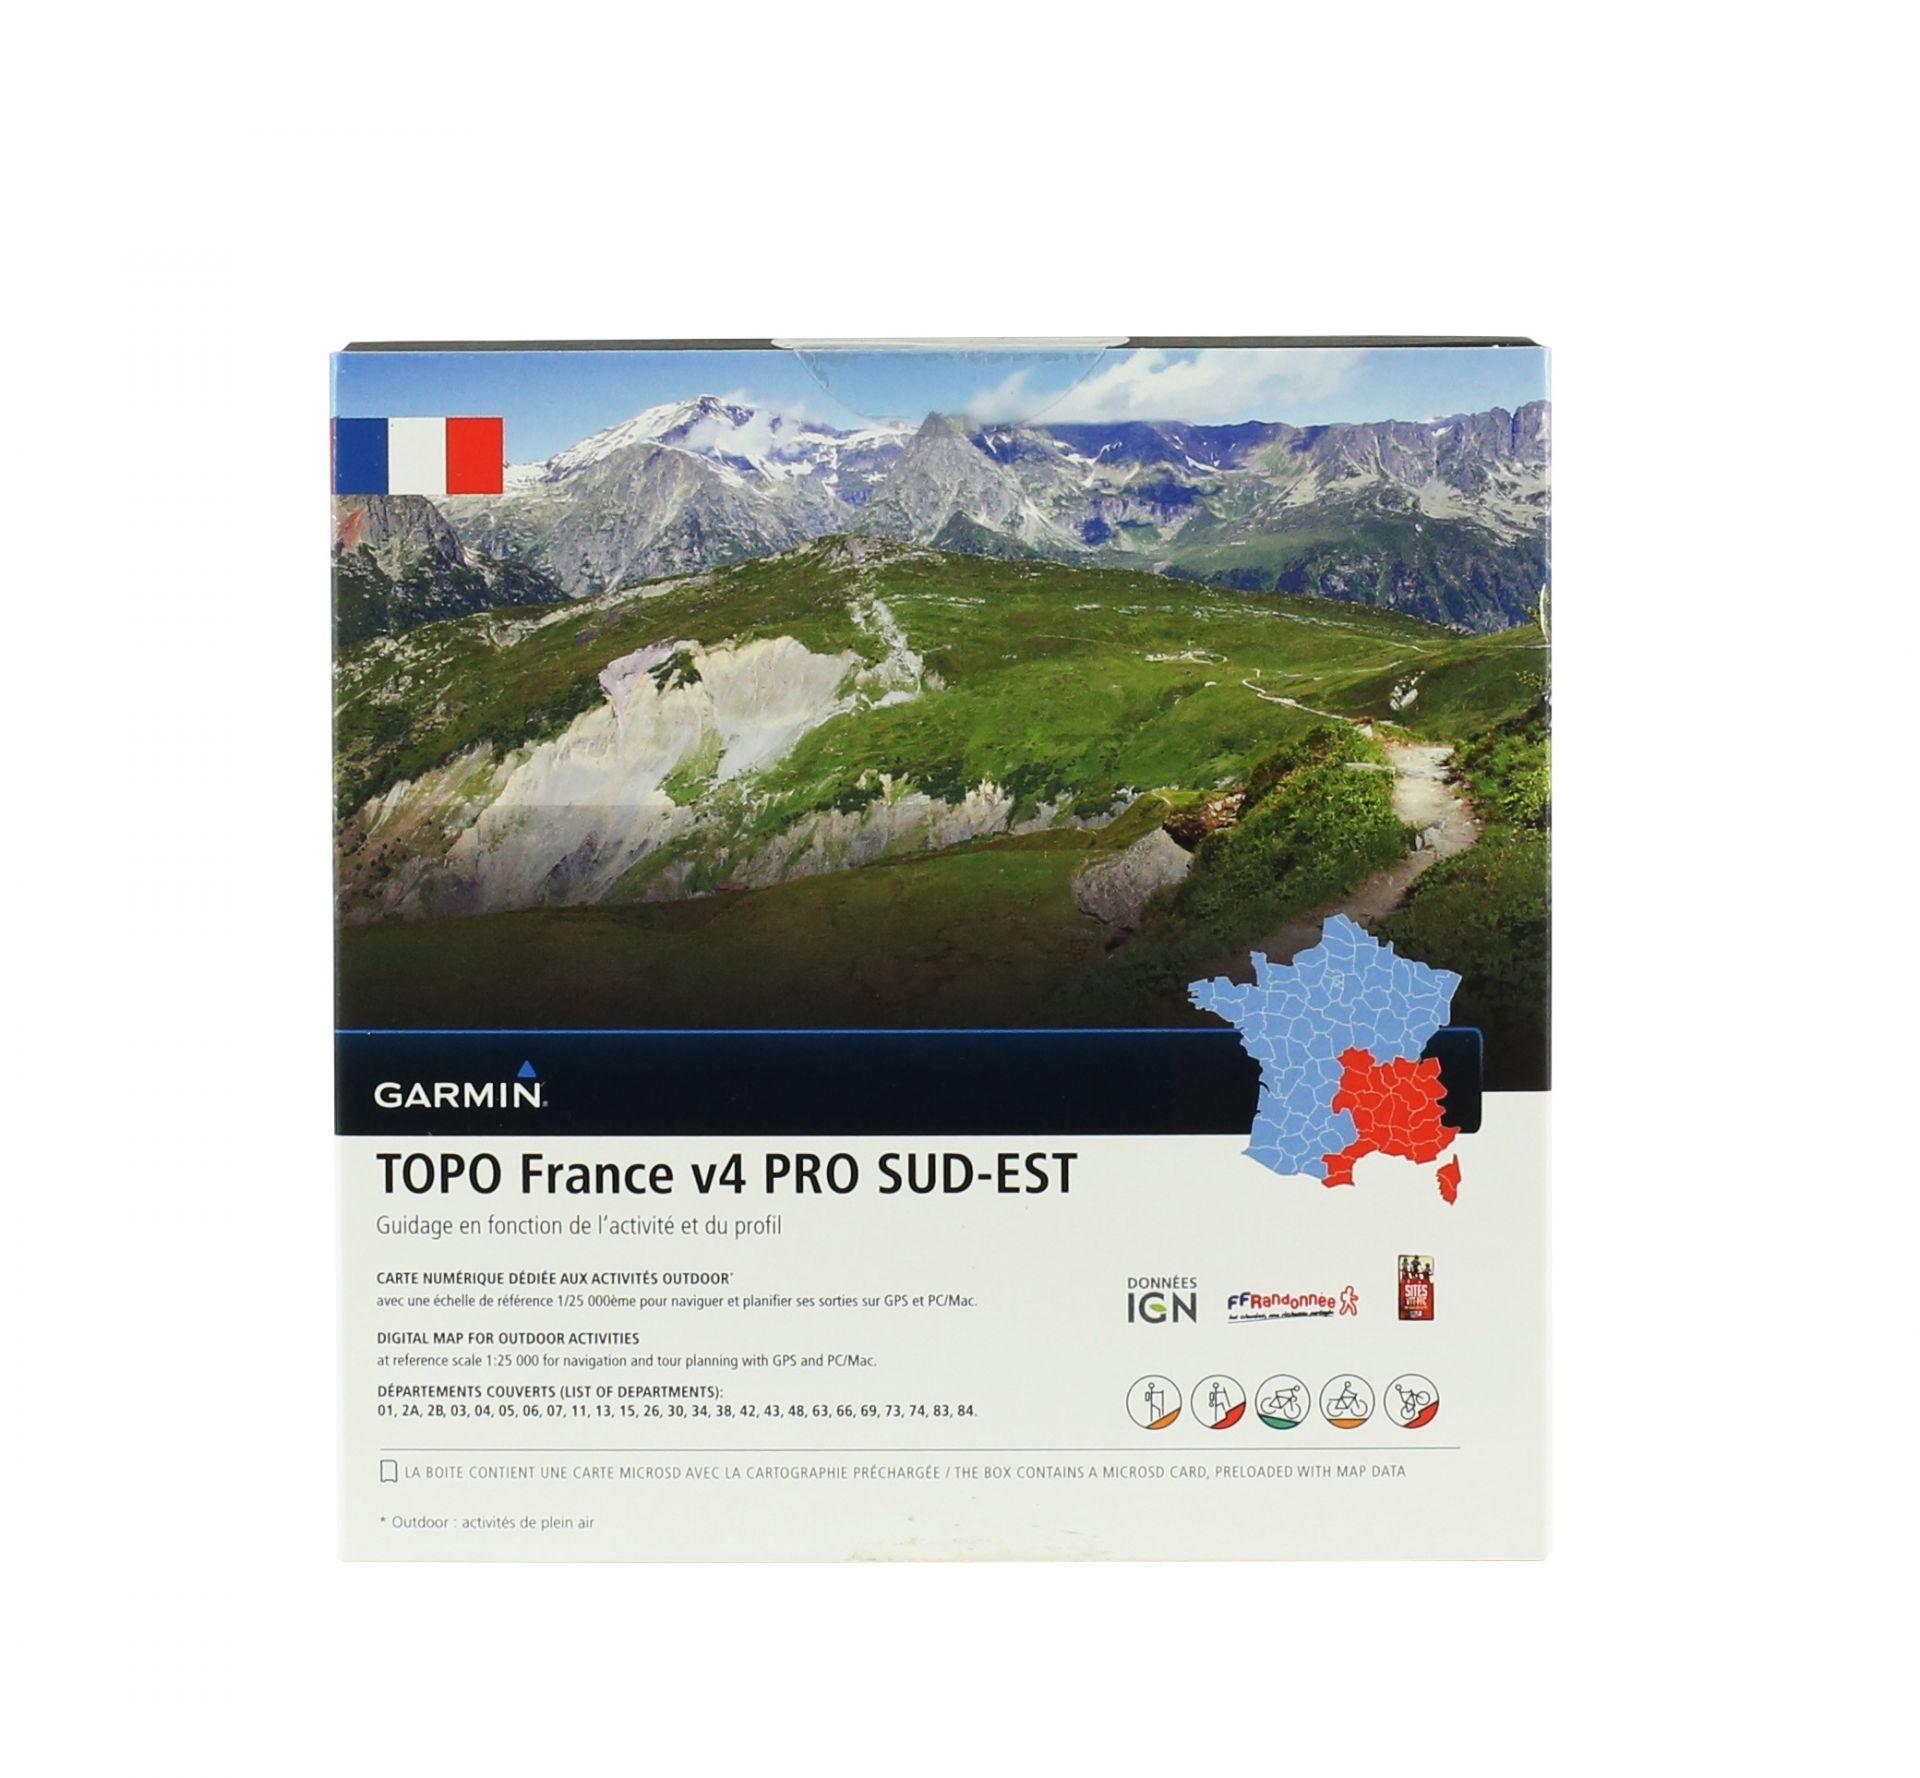 Cartographie Garmin IGN Topo France v4 Sud-Est Pro